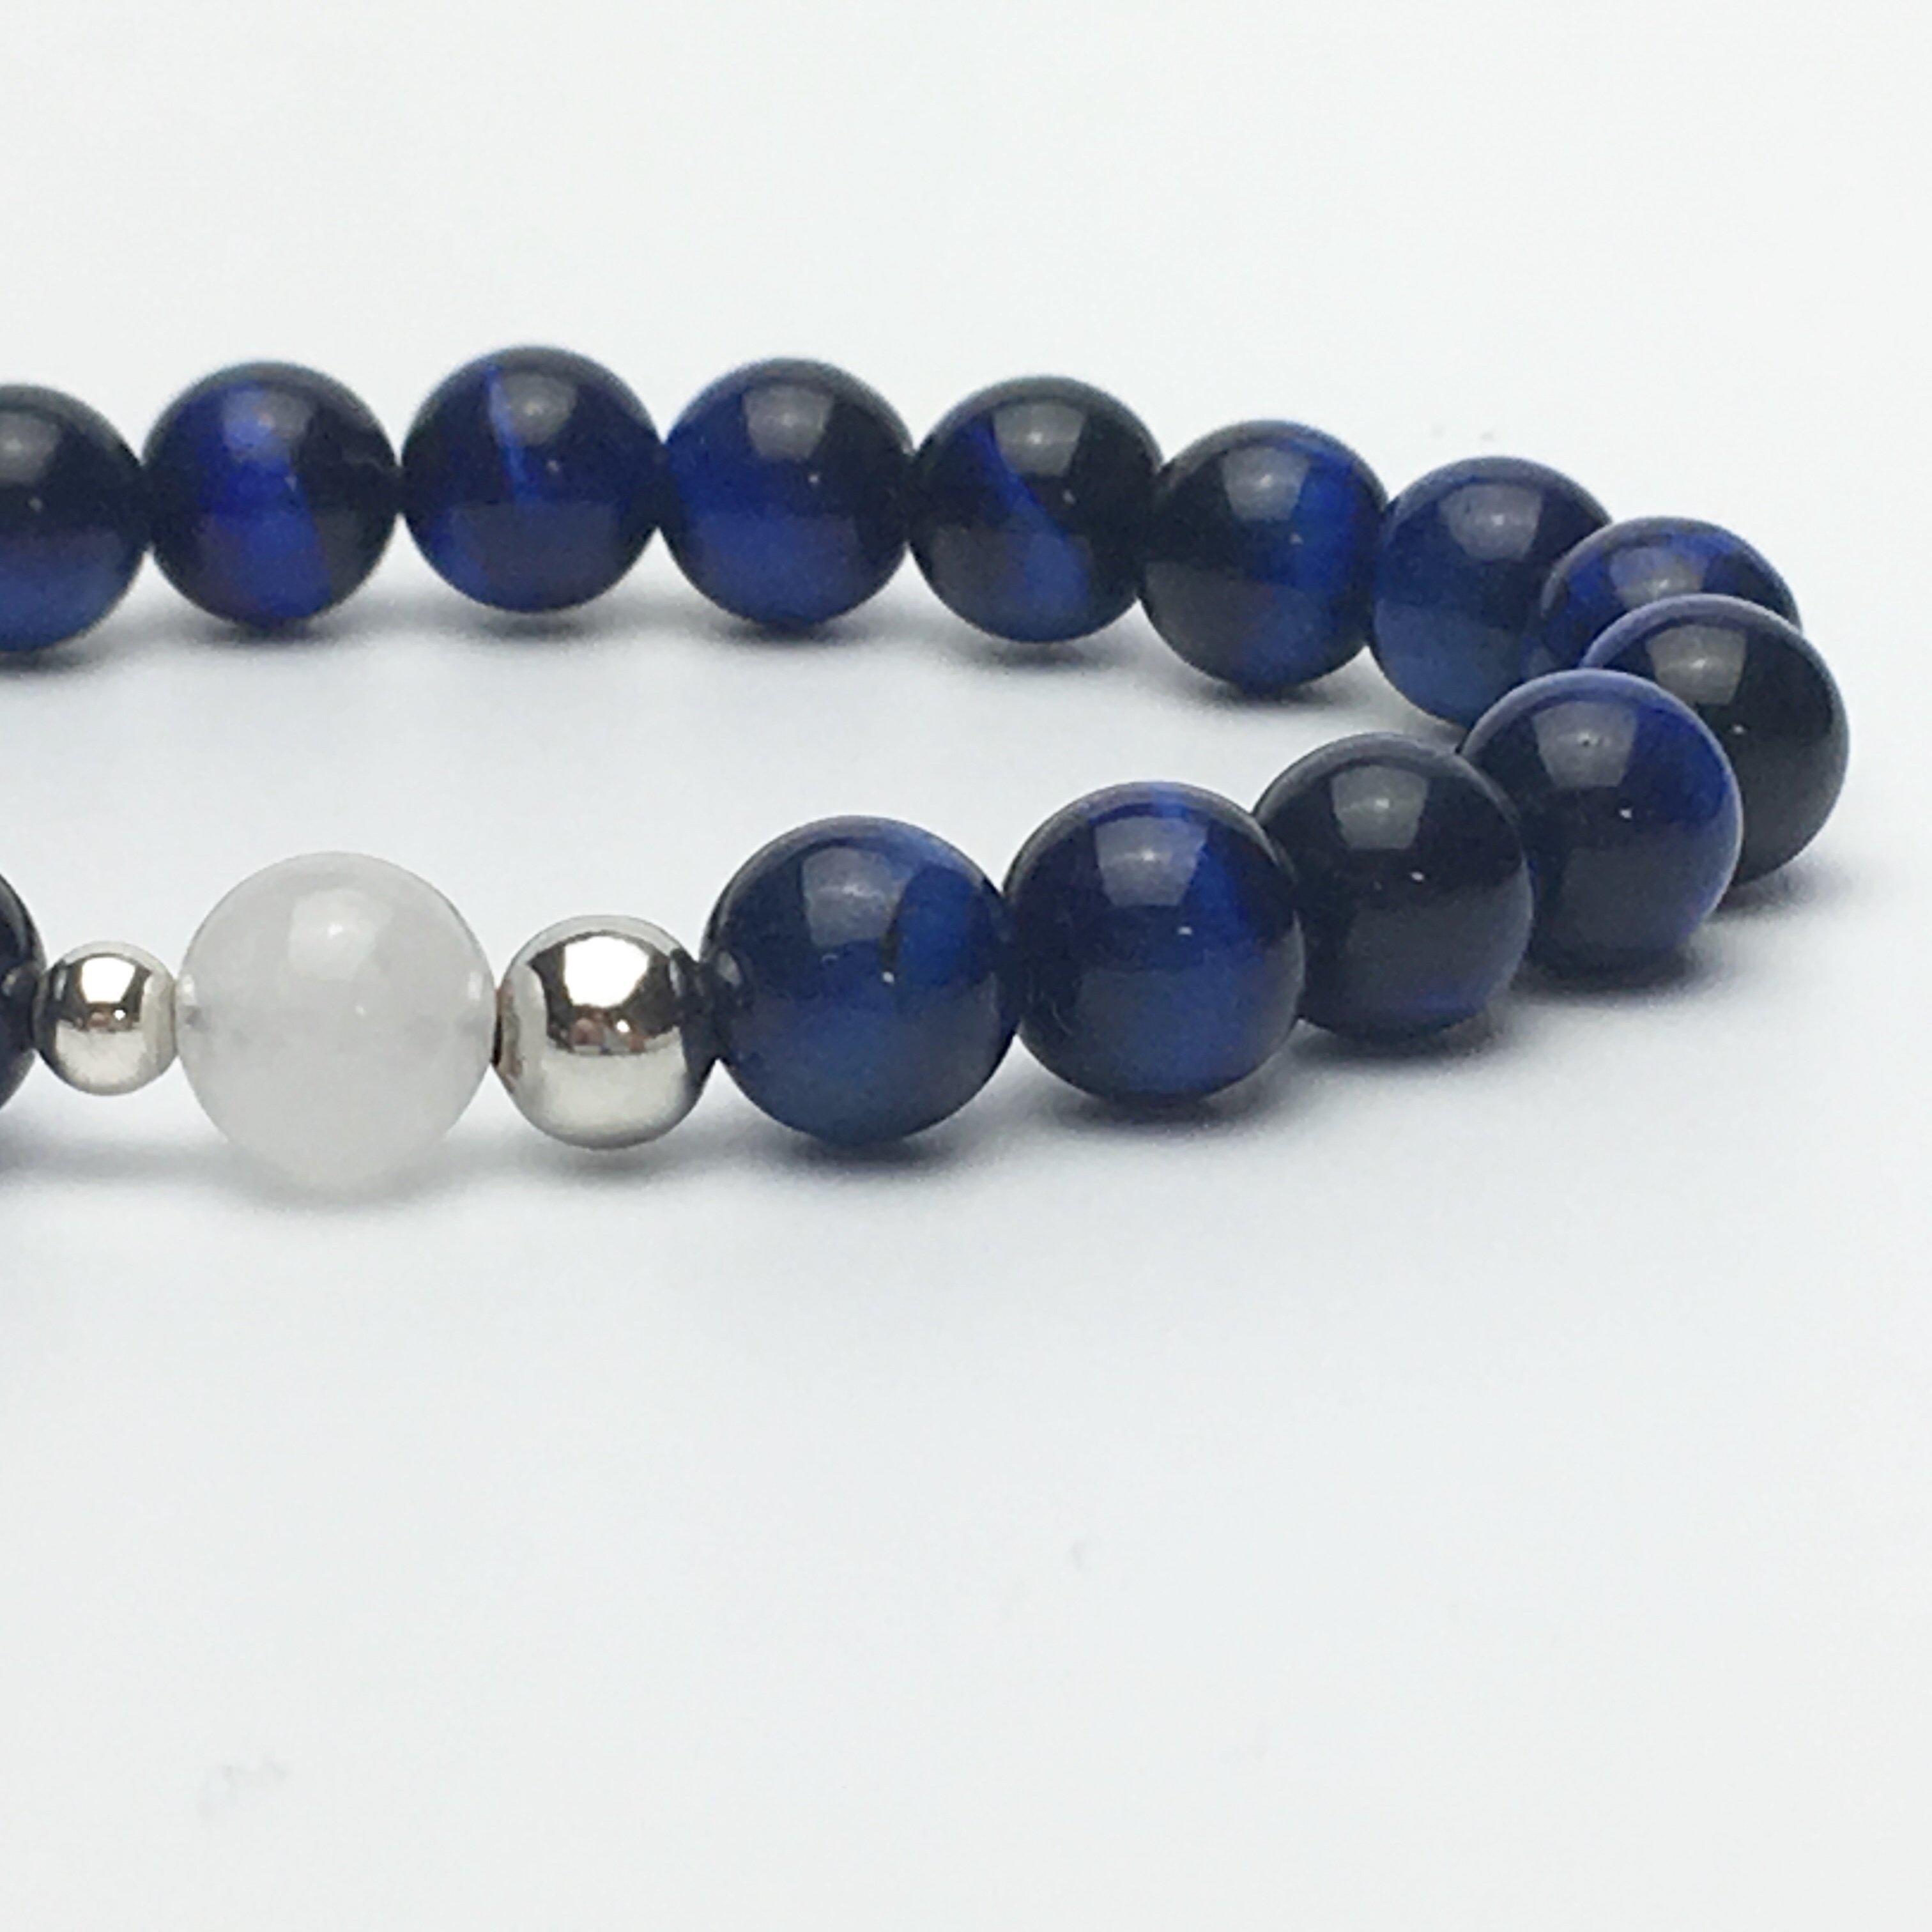 Blue Tigers Eye and White Jade Bead Bracelet